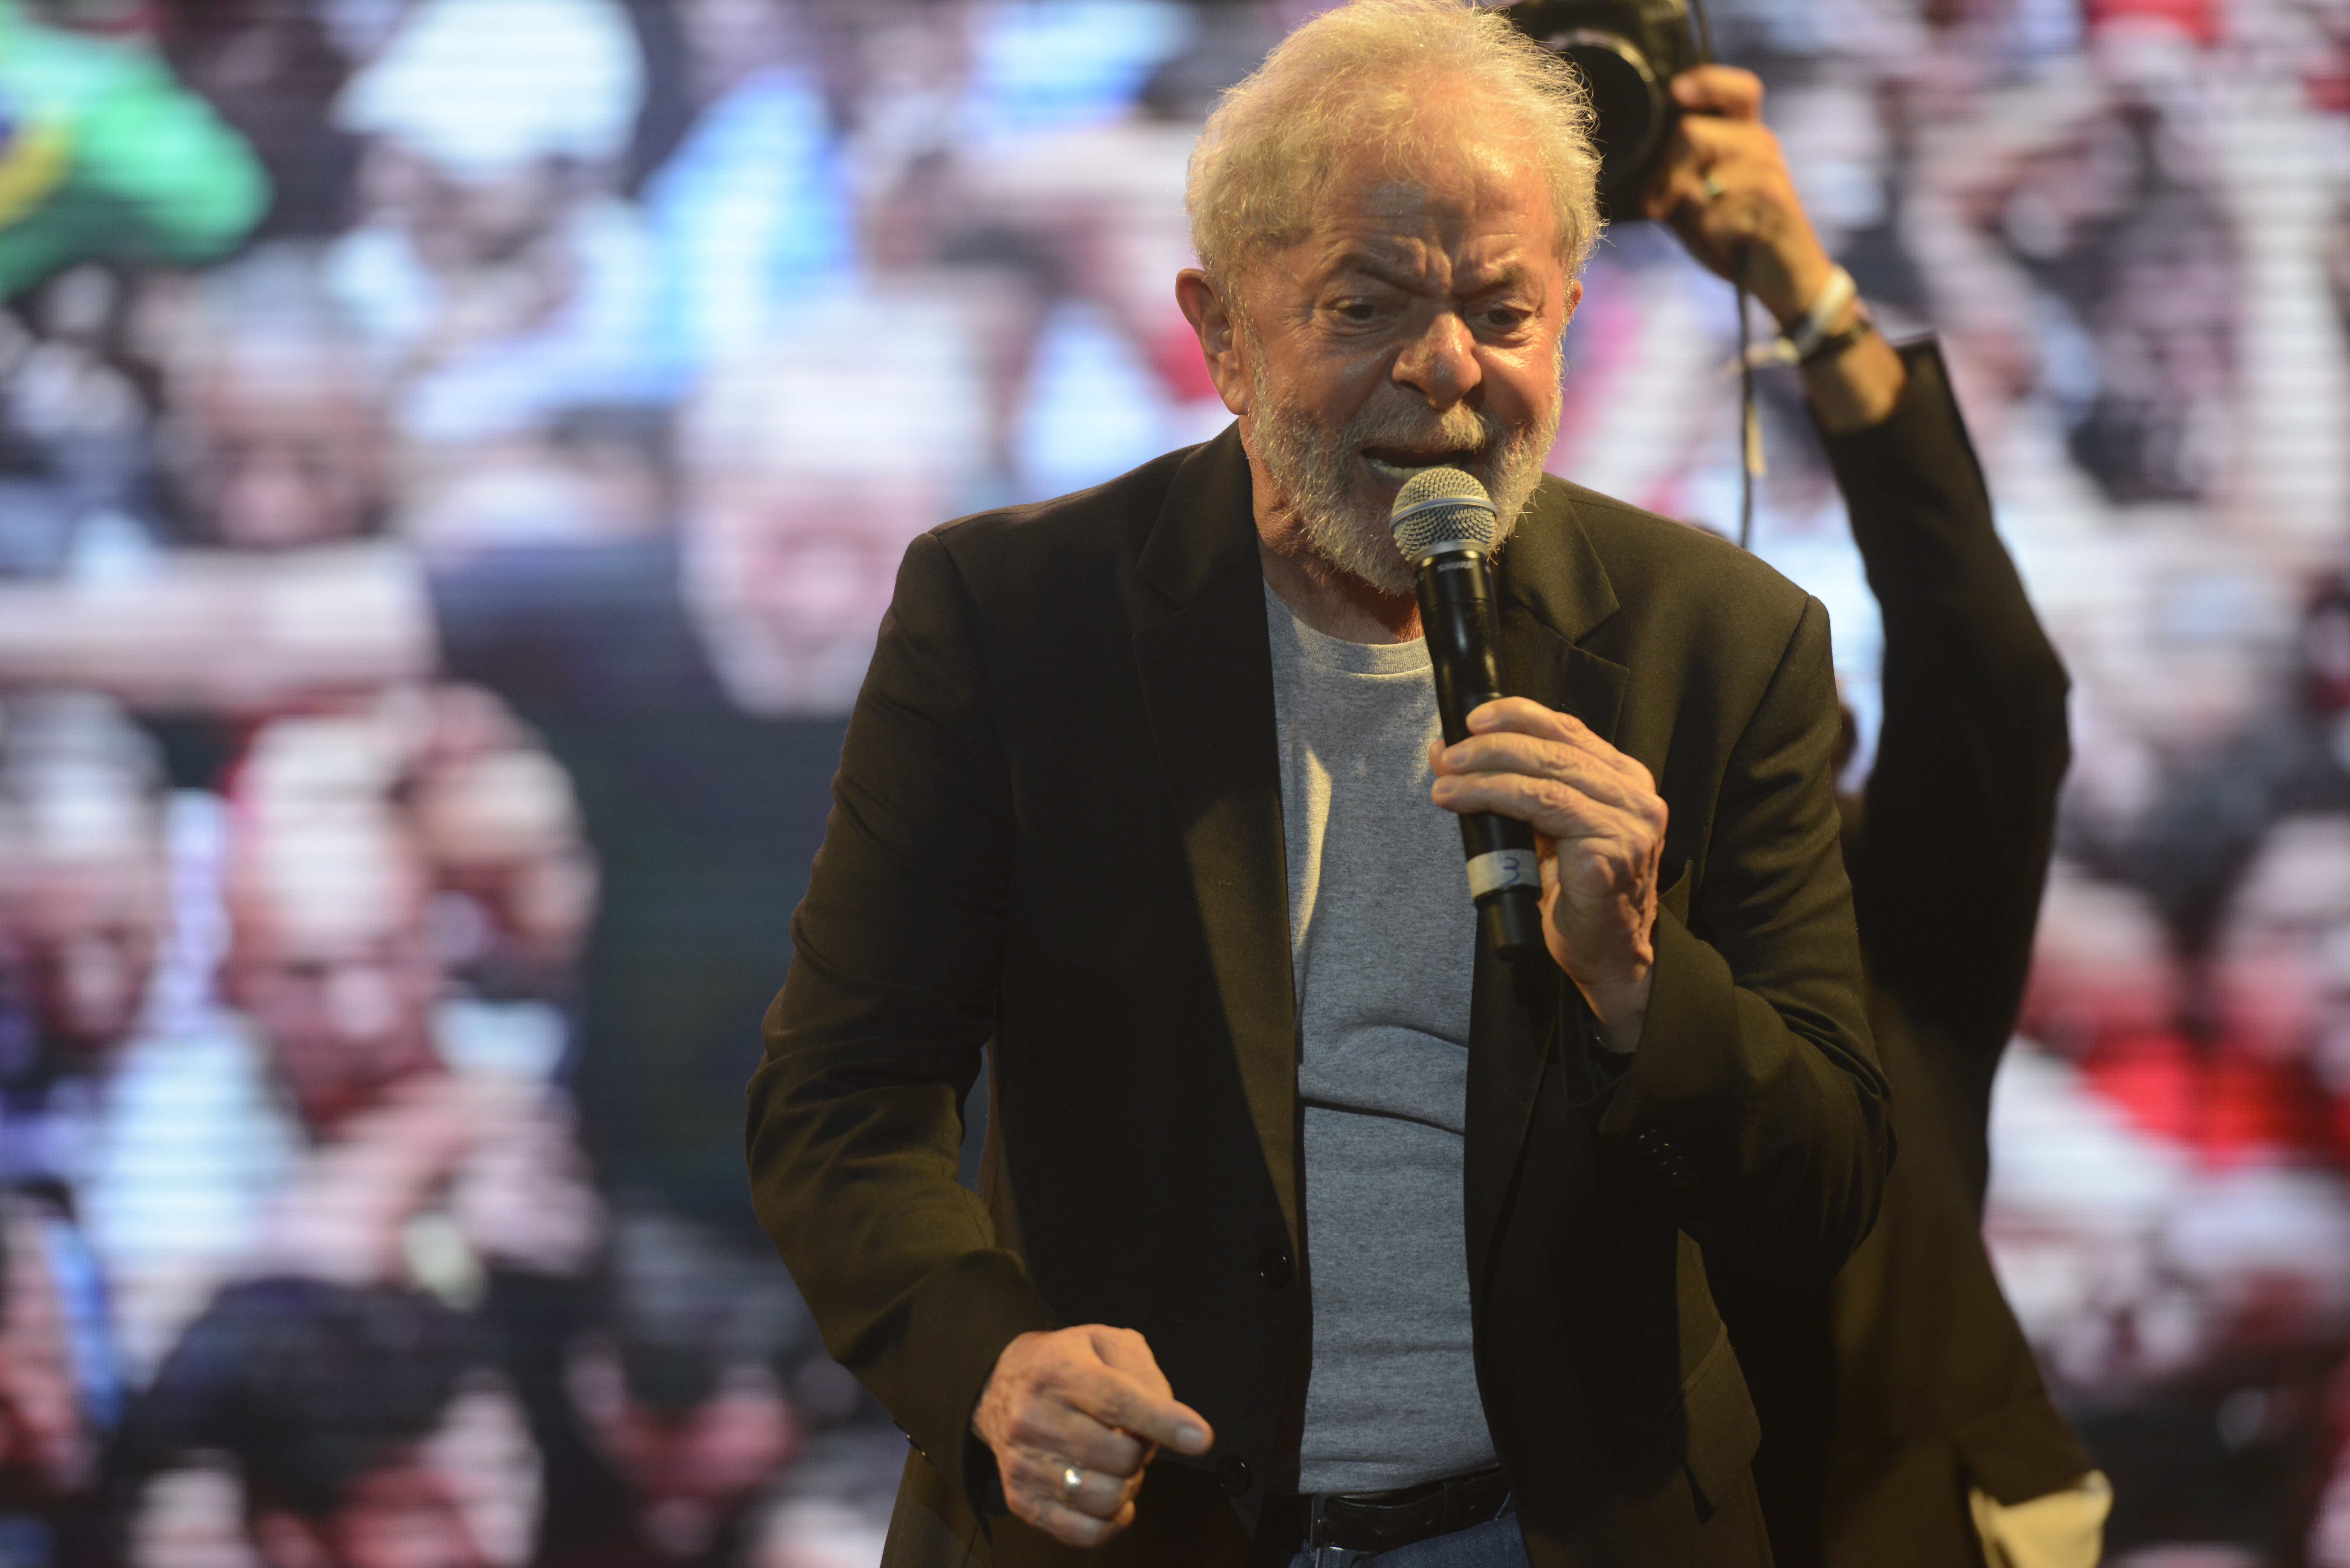 IMAGEM: Só em 2020, Lula